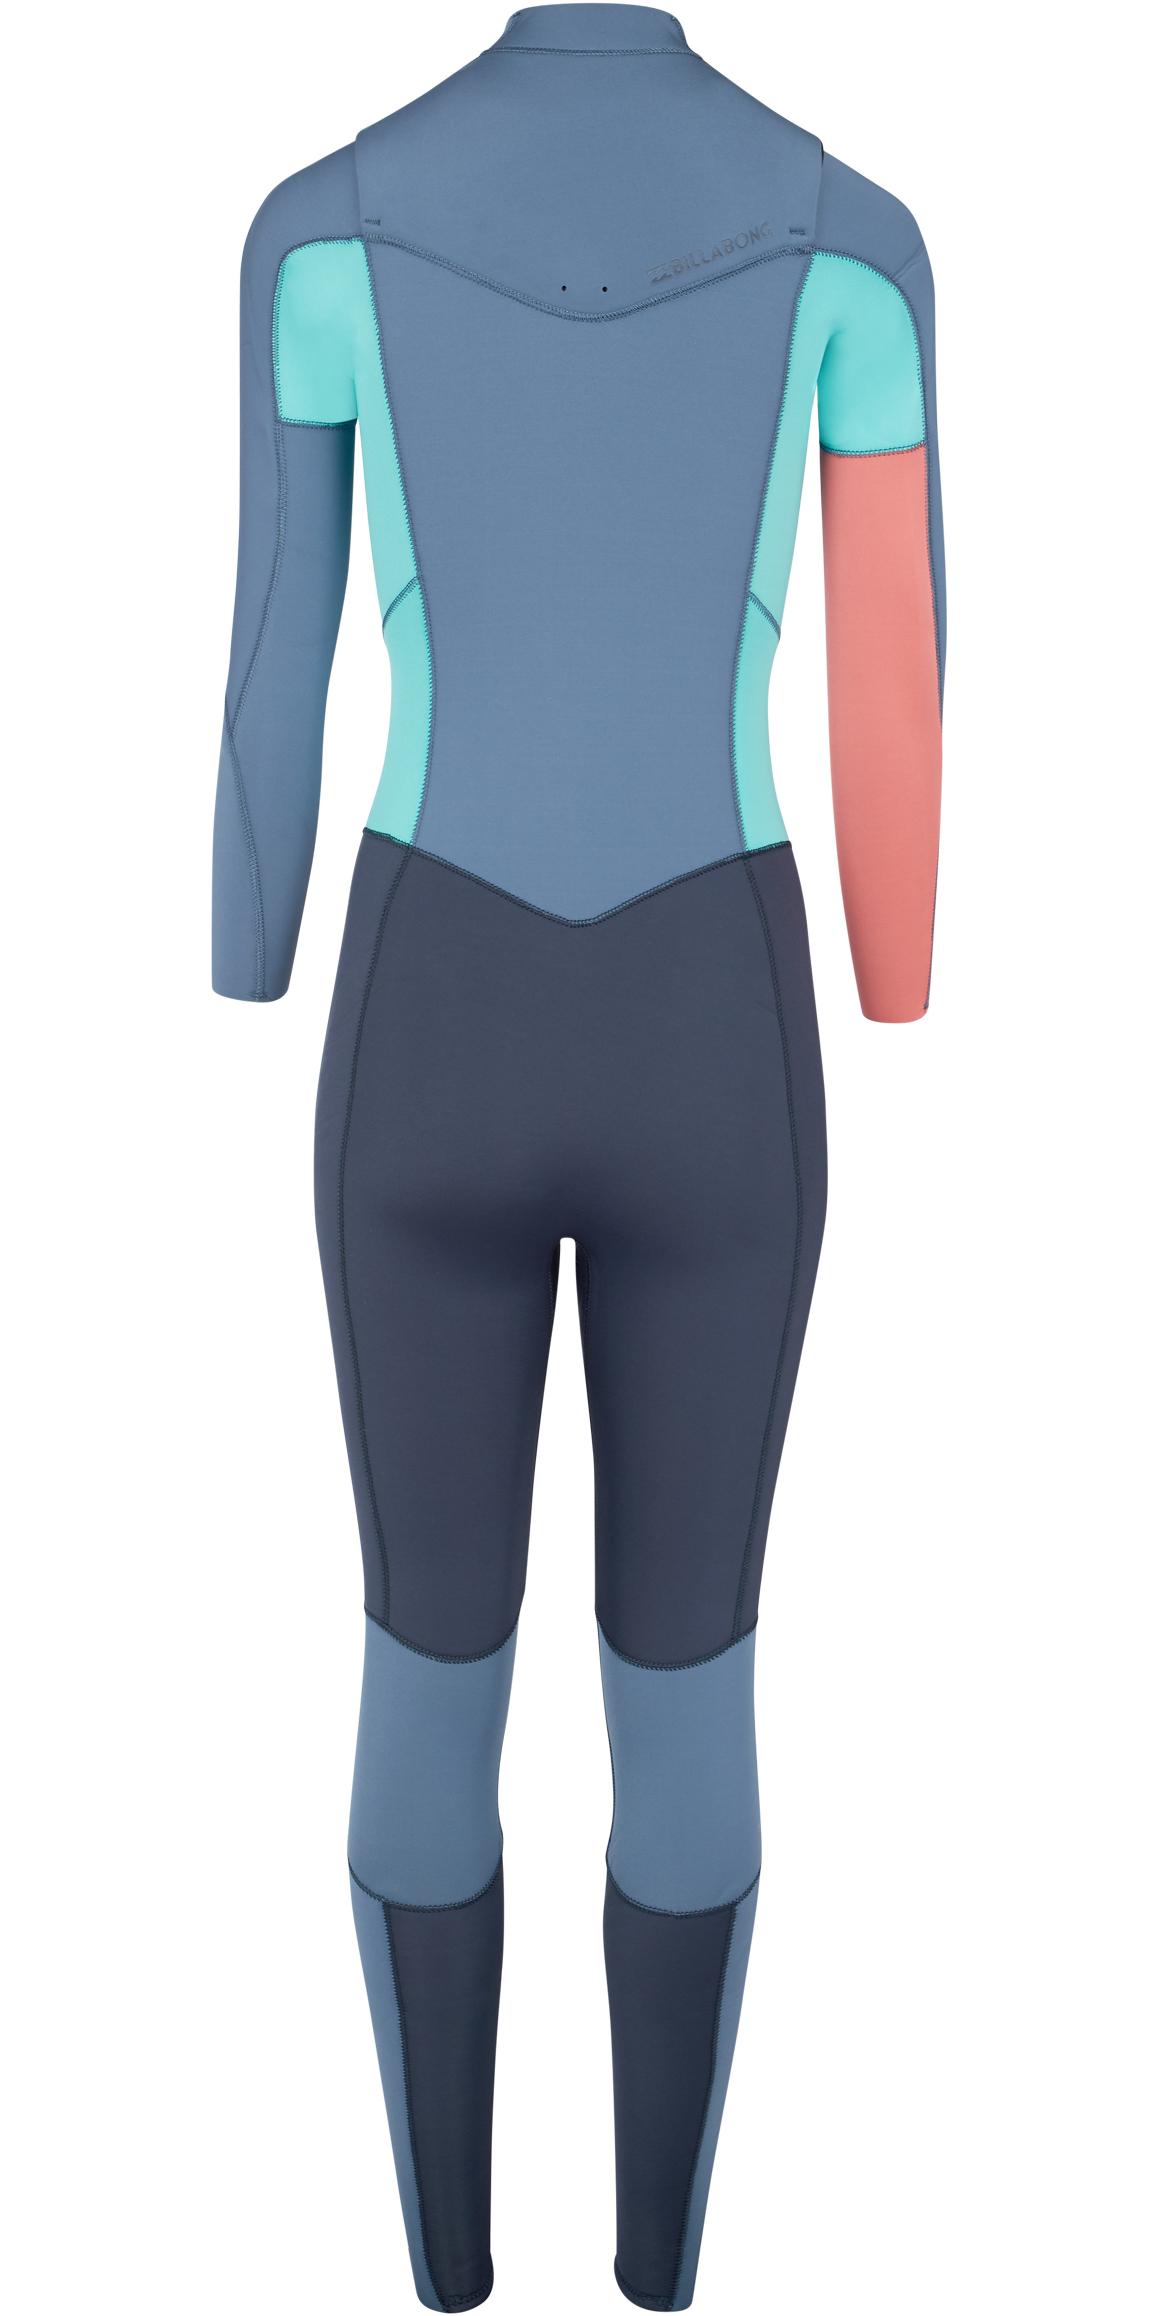 2019 Billabong Womens Furnace Synergy 5/4mm Chest Zip Wetsuit Slate L45G03